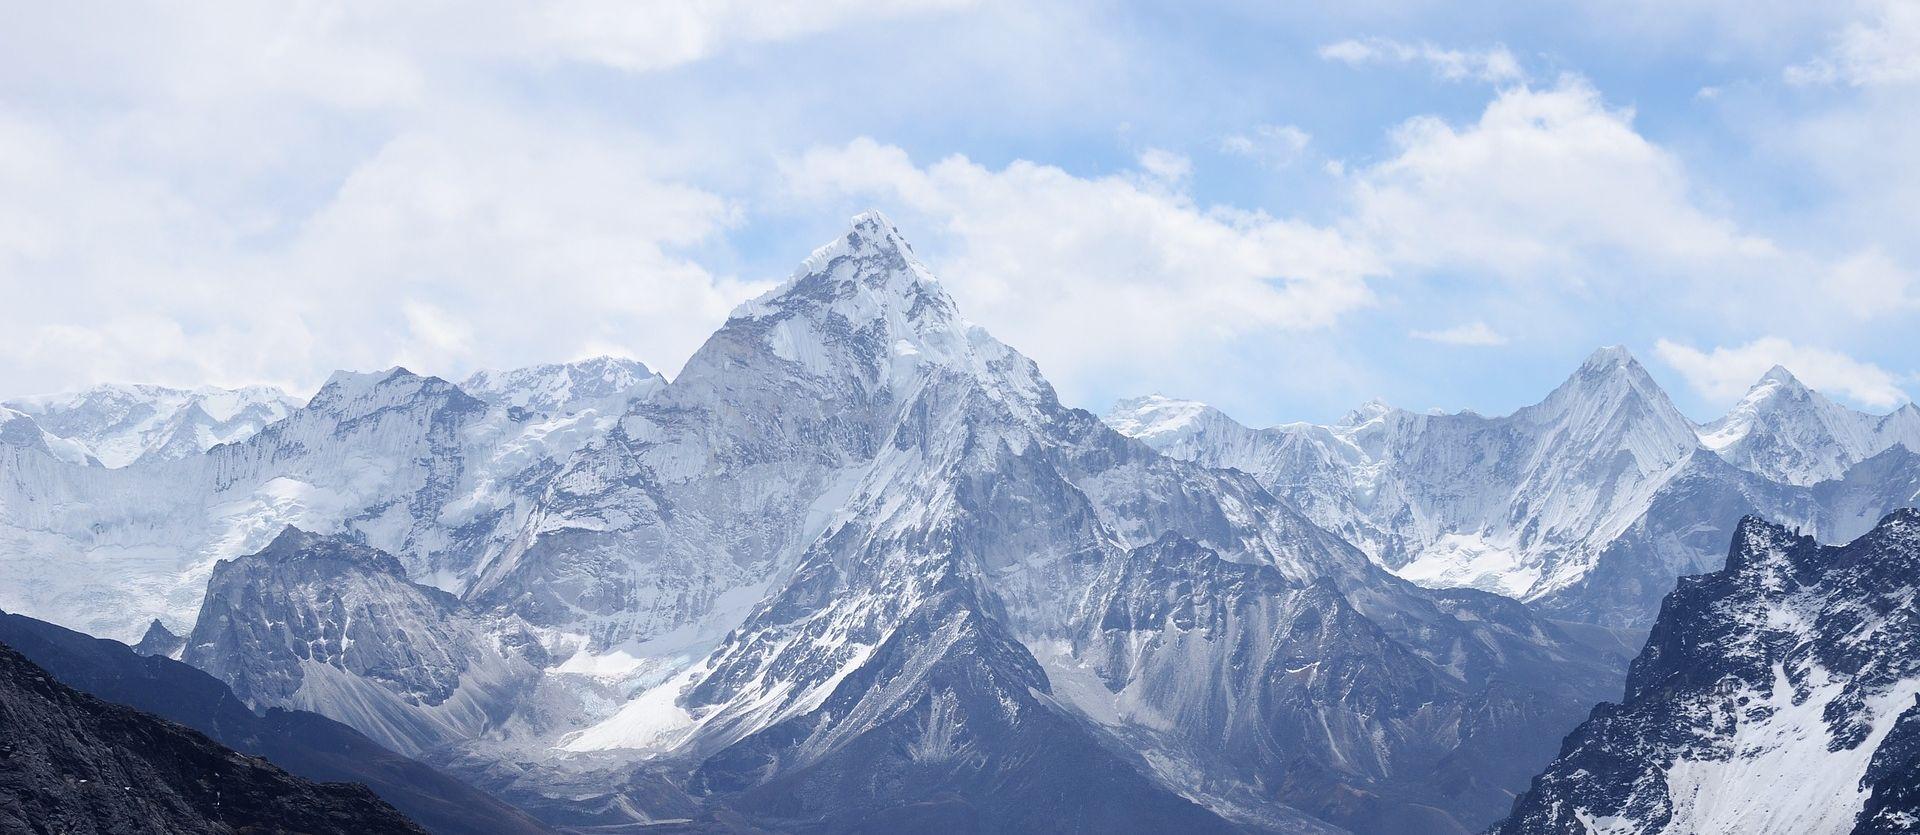 FELJTON Alpinisti iza 'željezne zavjese' na rubu smrti